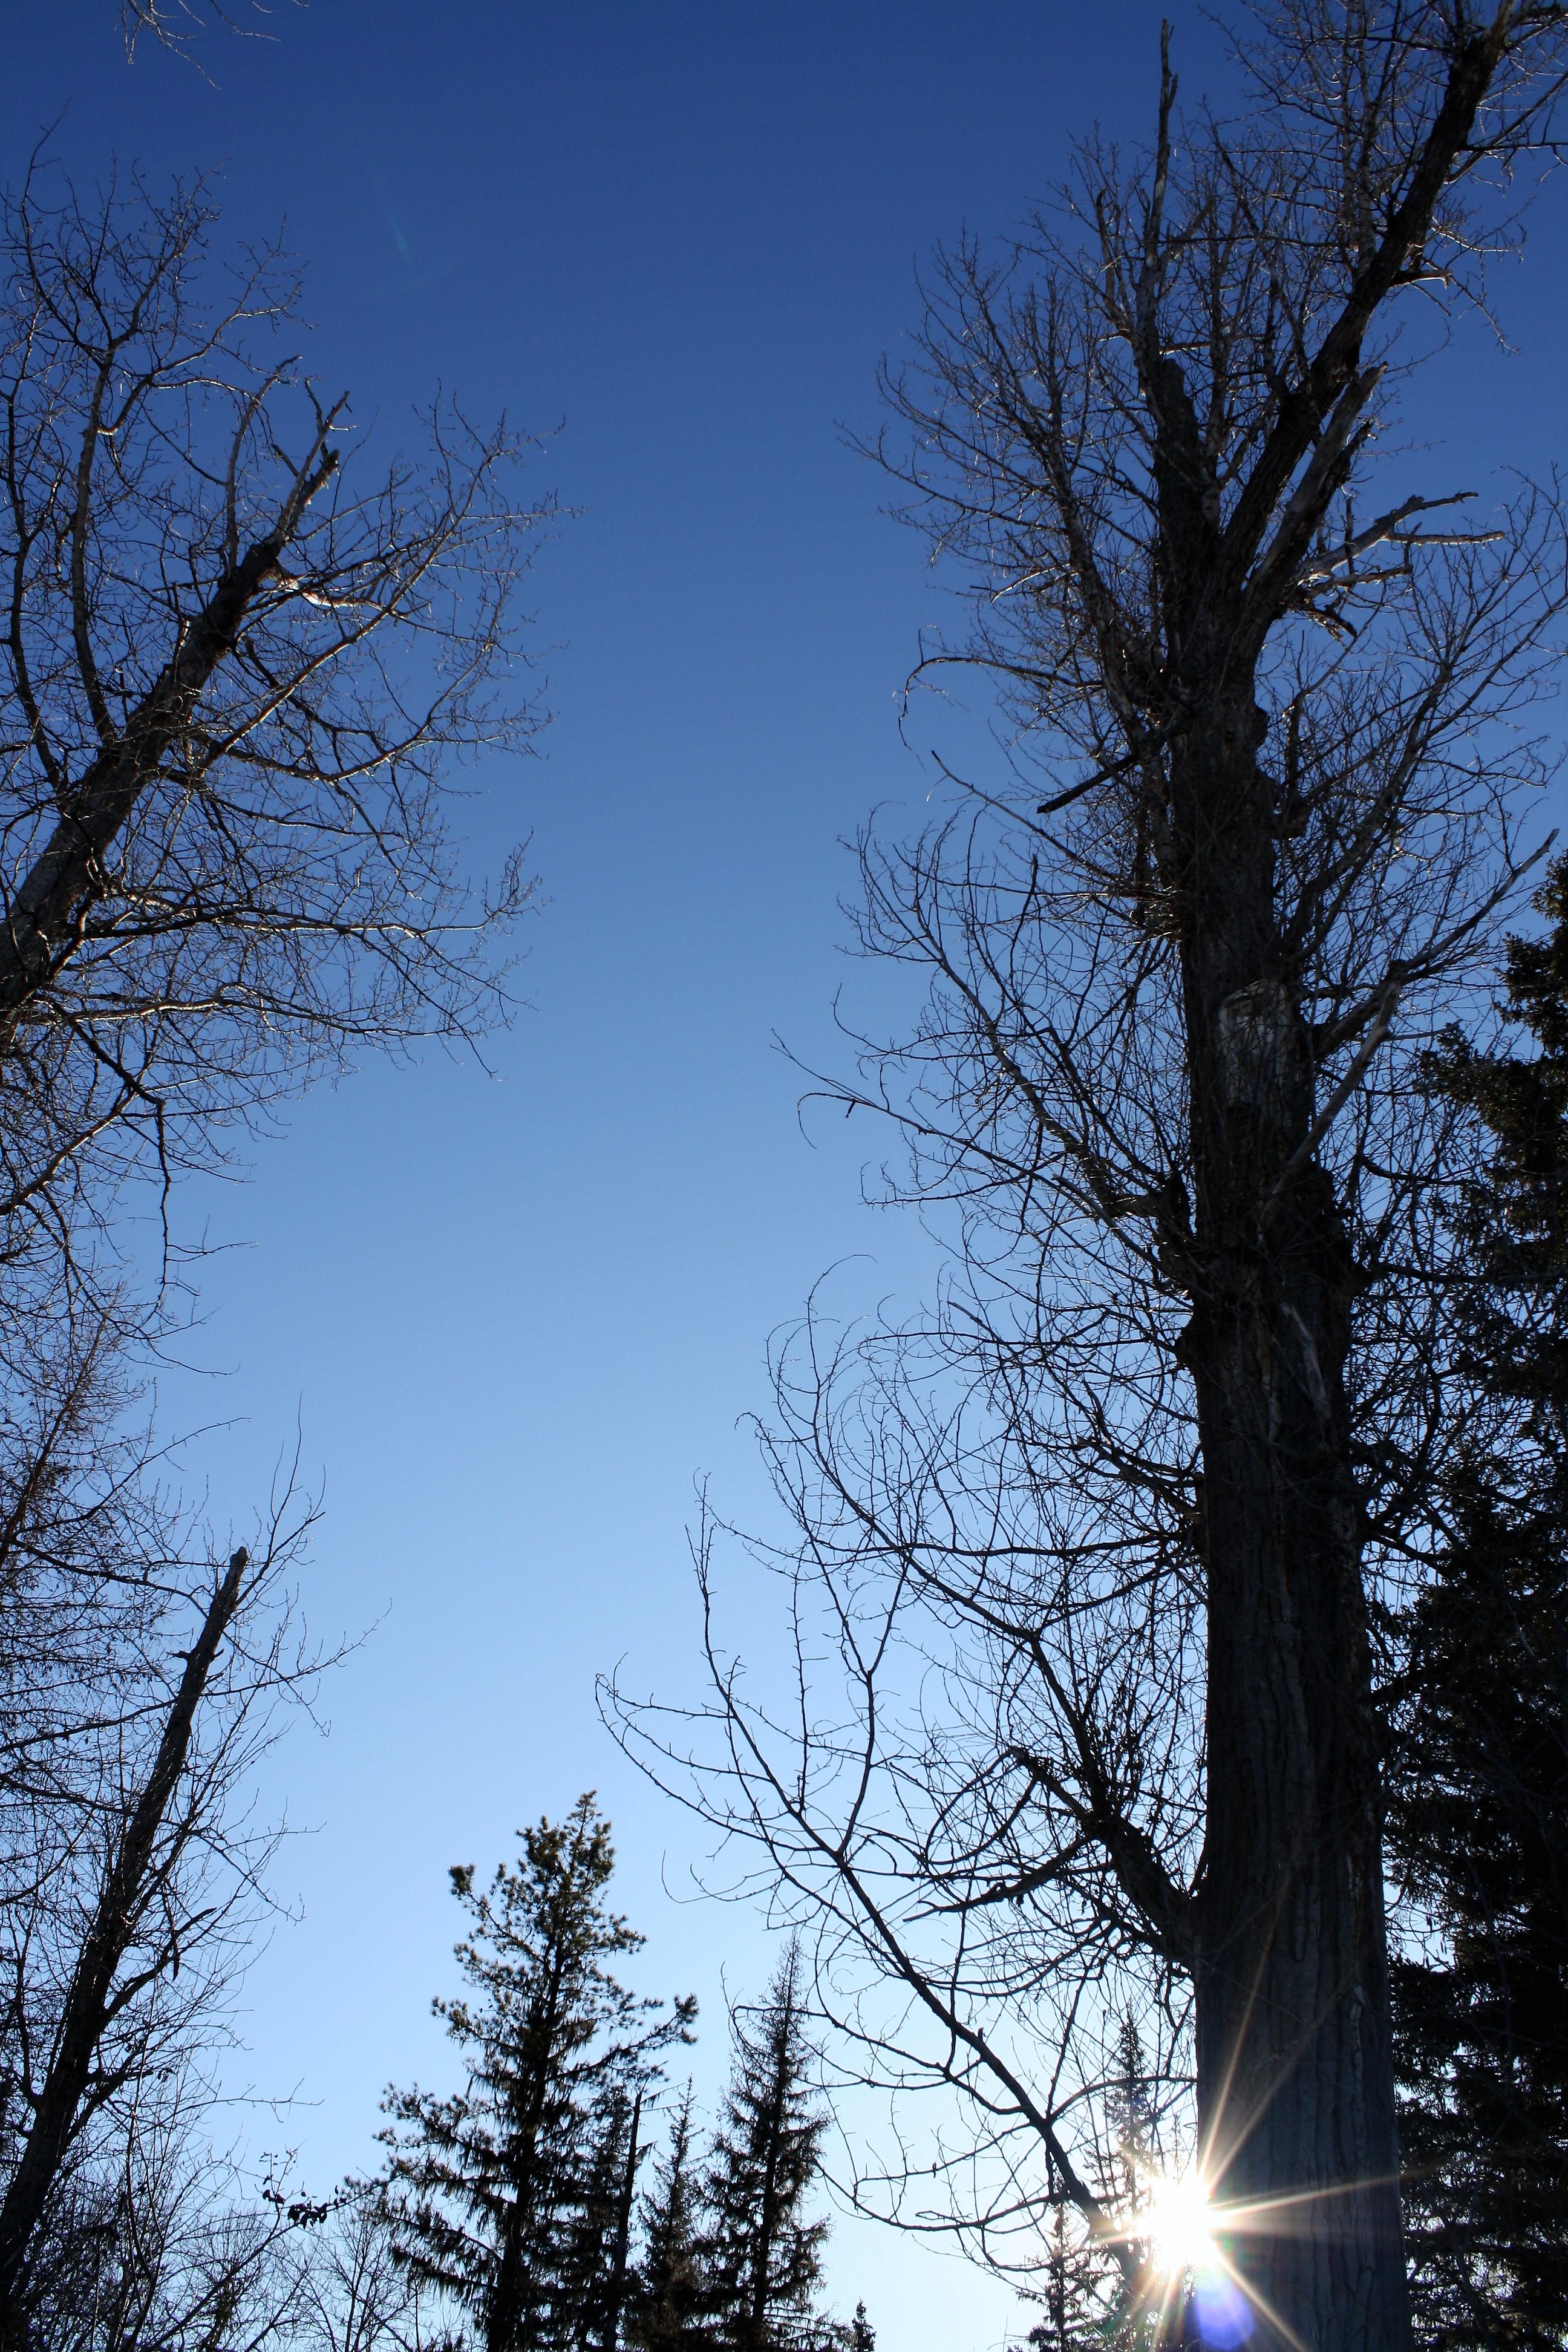 DM_nature_foliage_trees_0898